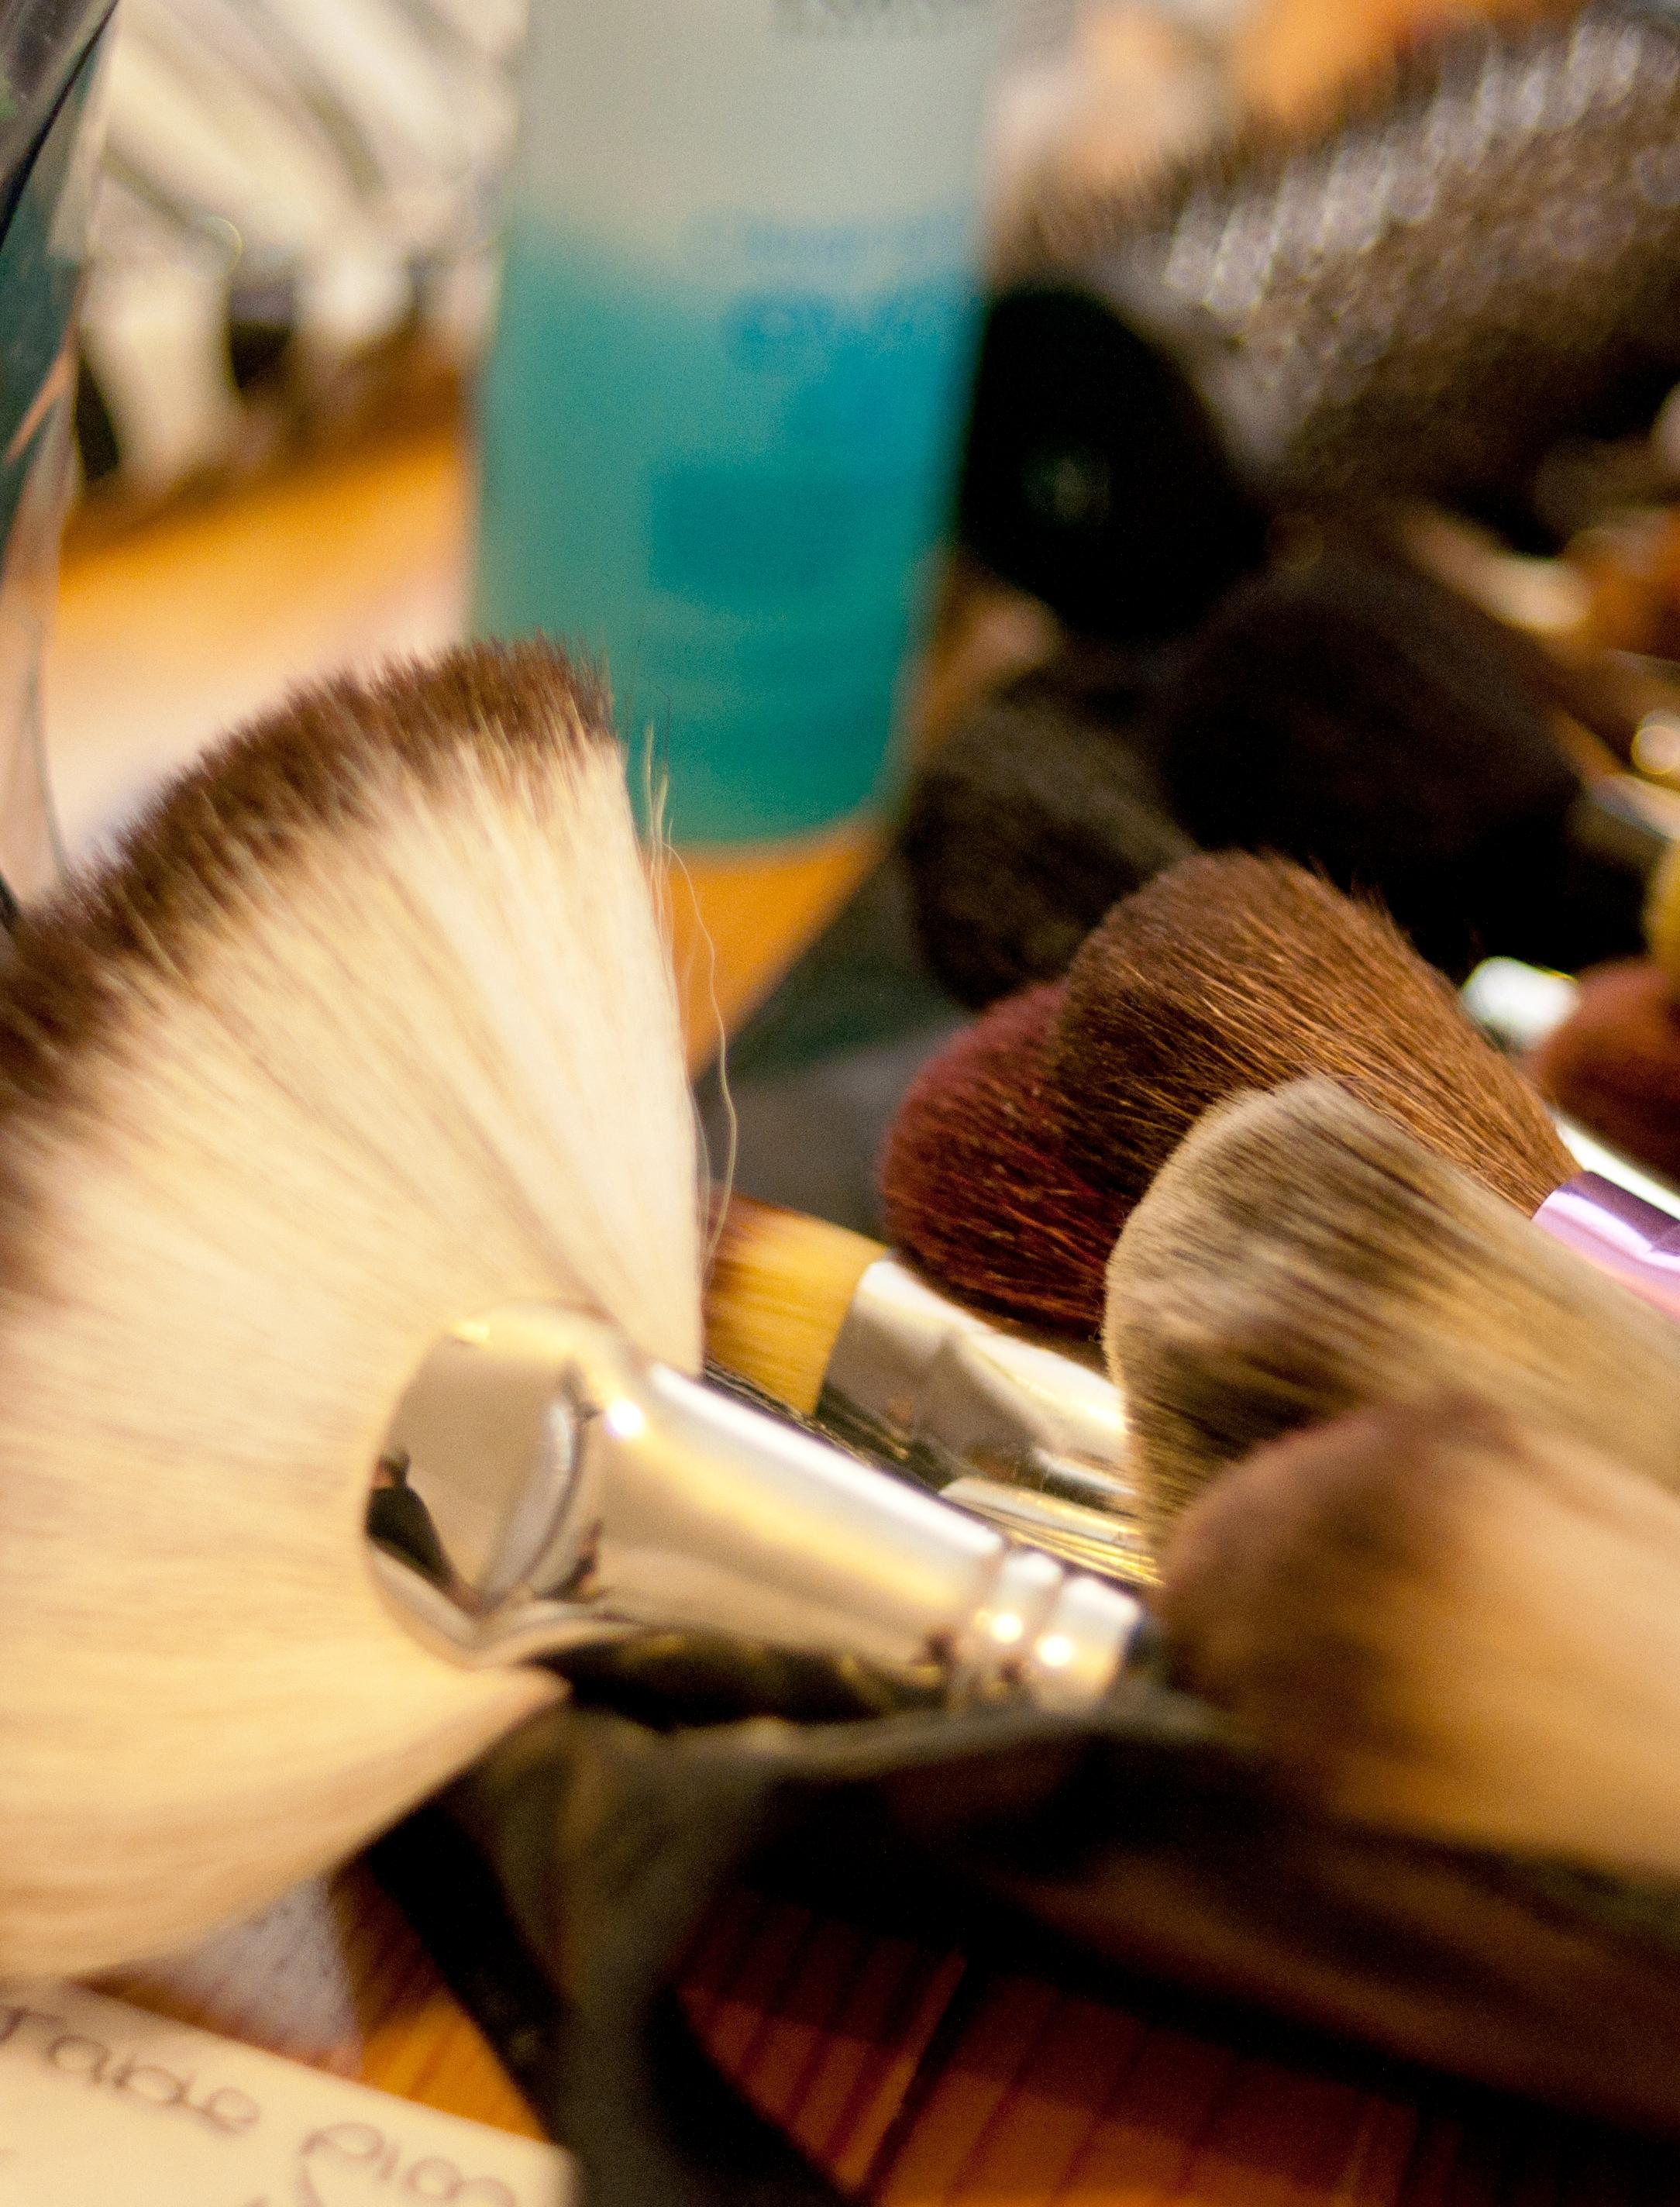 makeupbrusheslivfree